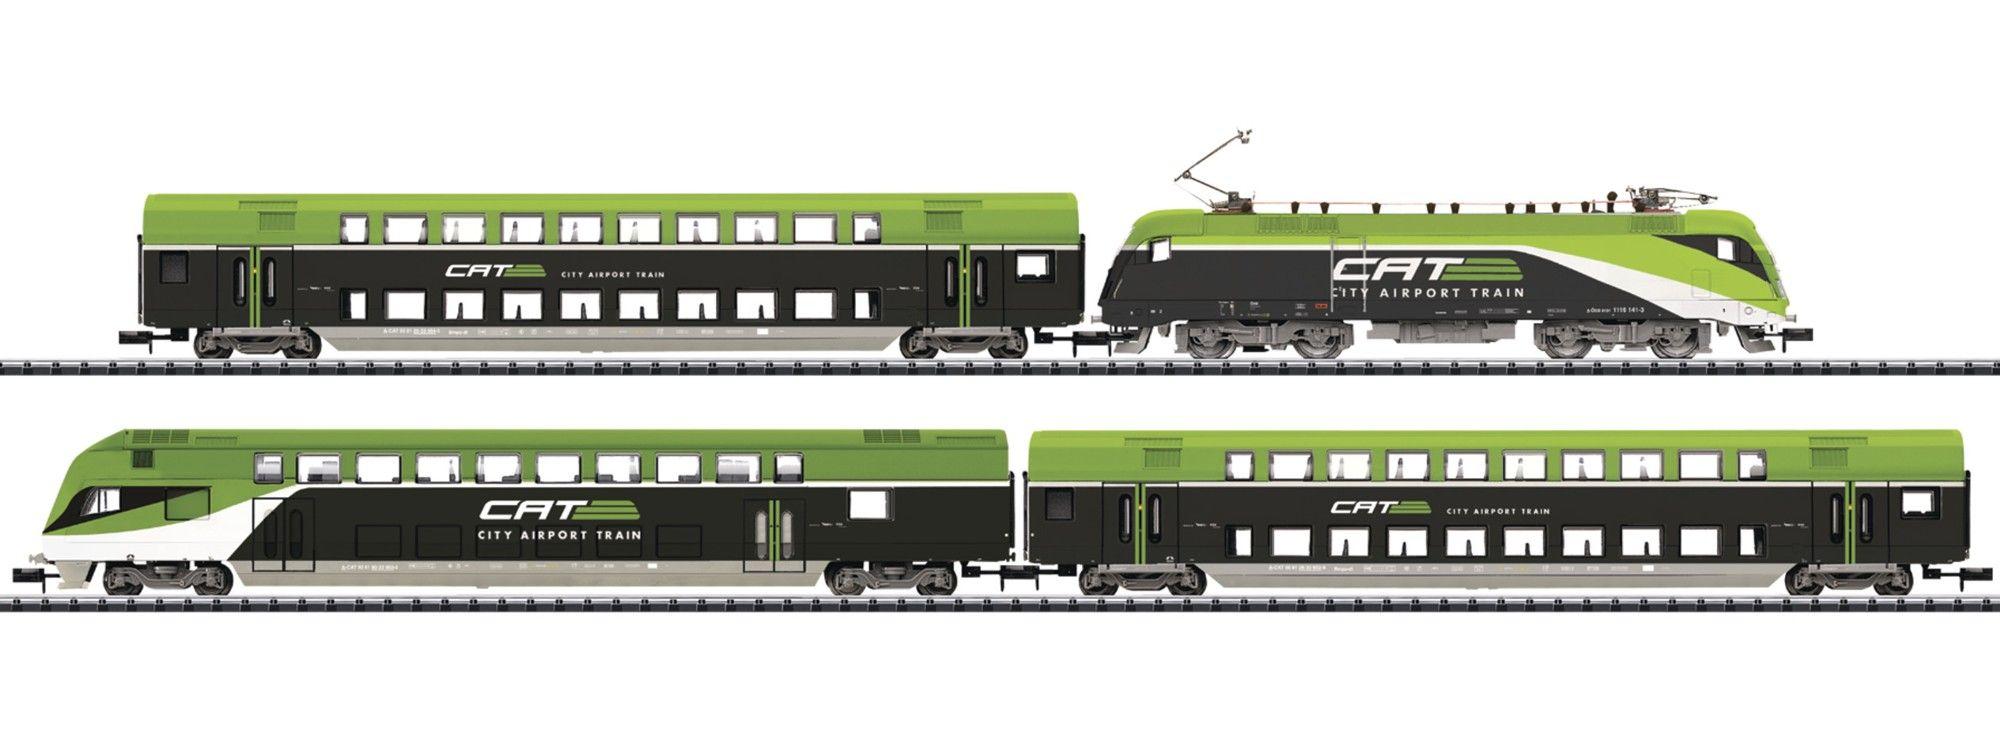 N Scale - Minitrix - 11622 - 4-Unit City Airport Train - ÖBB (Austrian Federal Railways) - 1116 141-3